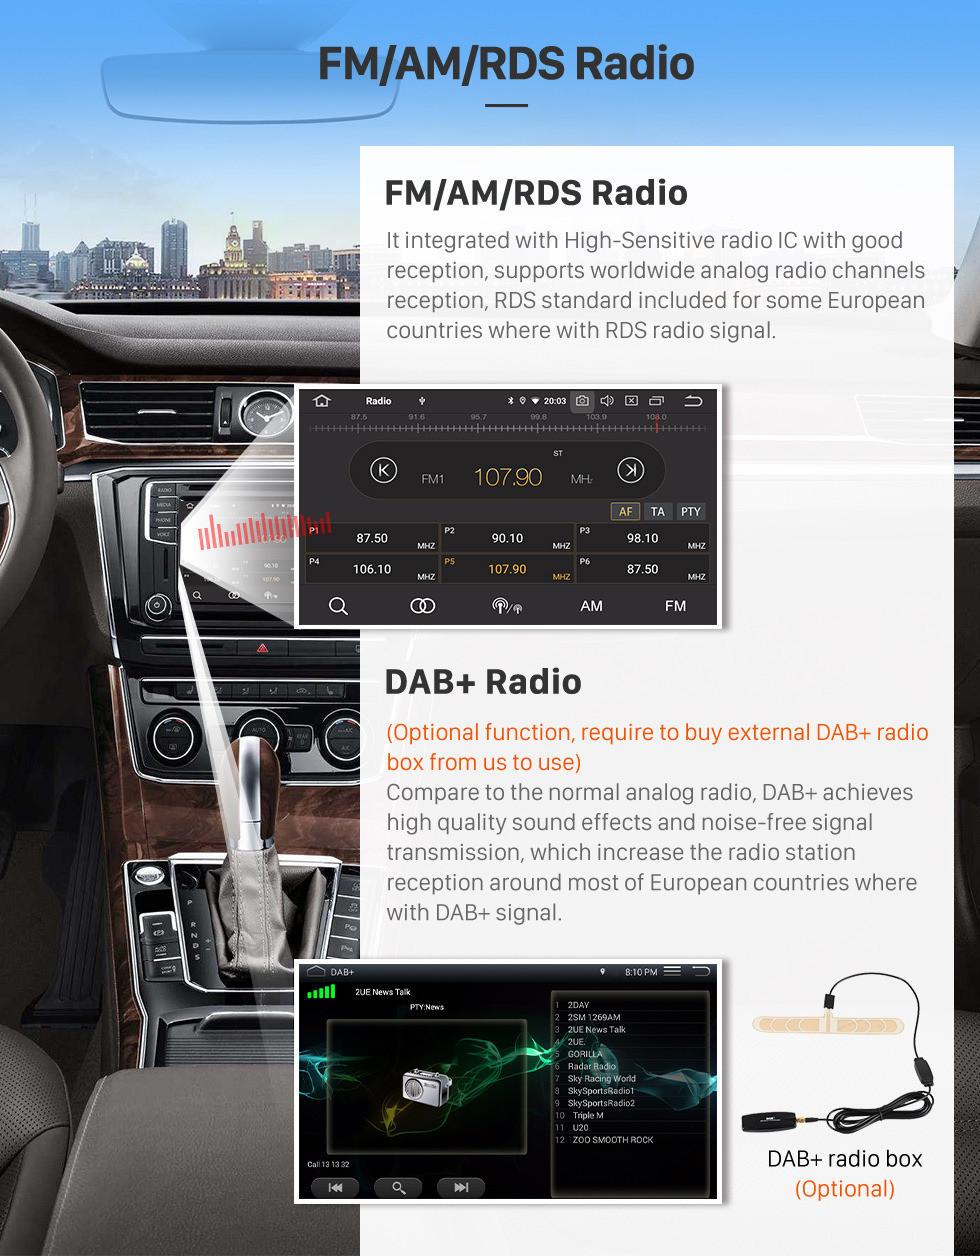 Seicane OEM GPS Navigation system 9 inch HD Touchscreen Android 9.0 Radio for 2005-2012 BMW 3 Series E90 E91 E92 E93 316i 318i 320i 320si 323i 325i 328i 330i 335i 335is M3 316d 318d 320d 325d 330d 335d with bluetooth WIFI USB Steering Wheel Control